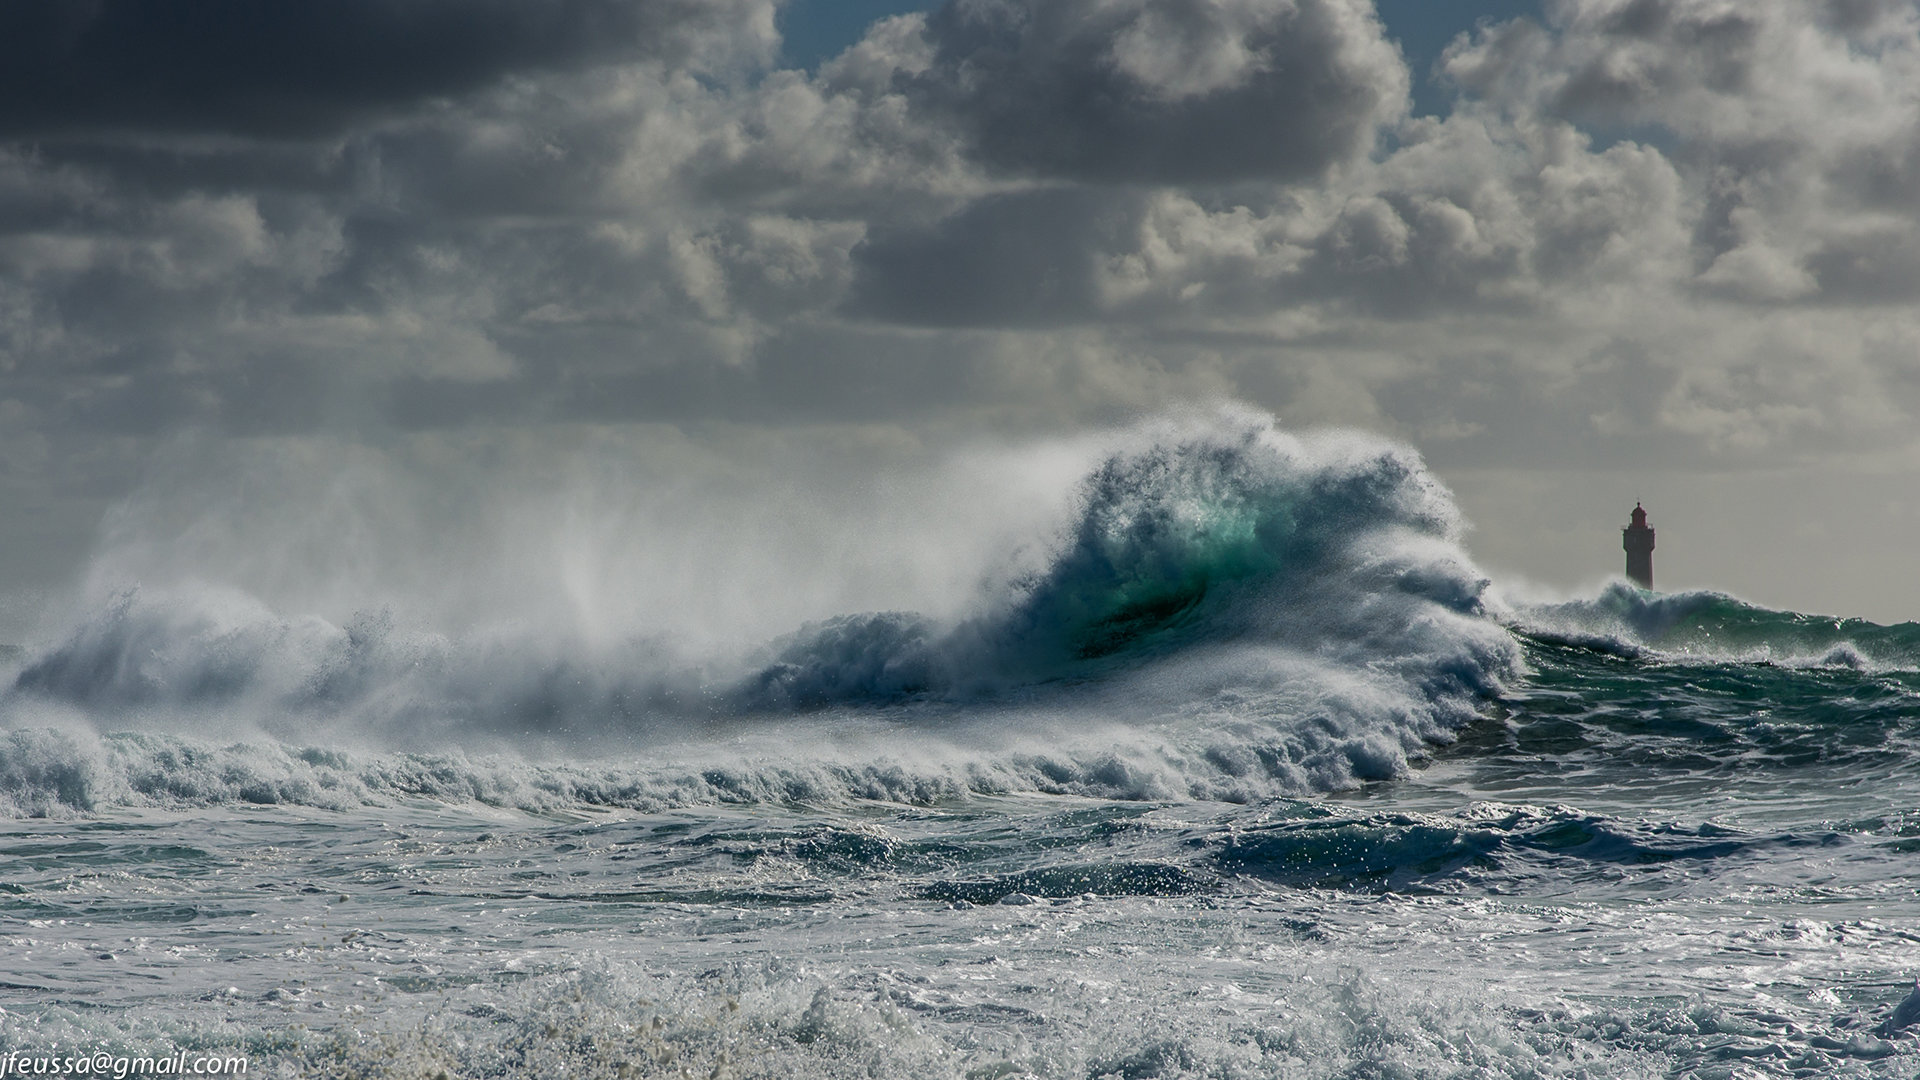 Hd Wallpapers 1080p Ocean: High Resolution Ocean Hd 1080p Wallpaper ID:393407 For Desktop